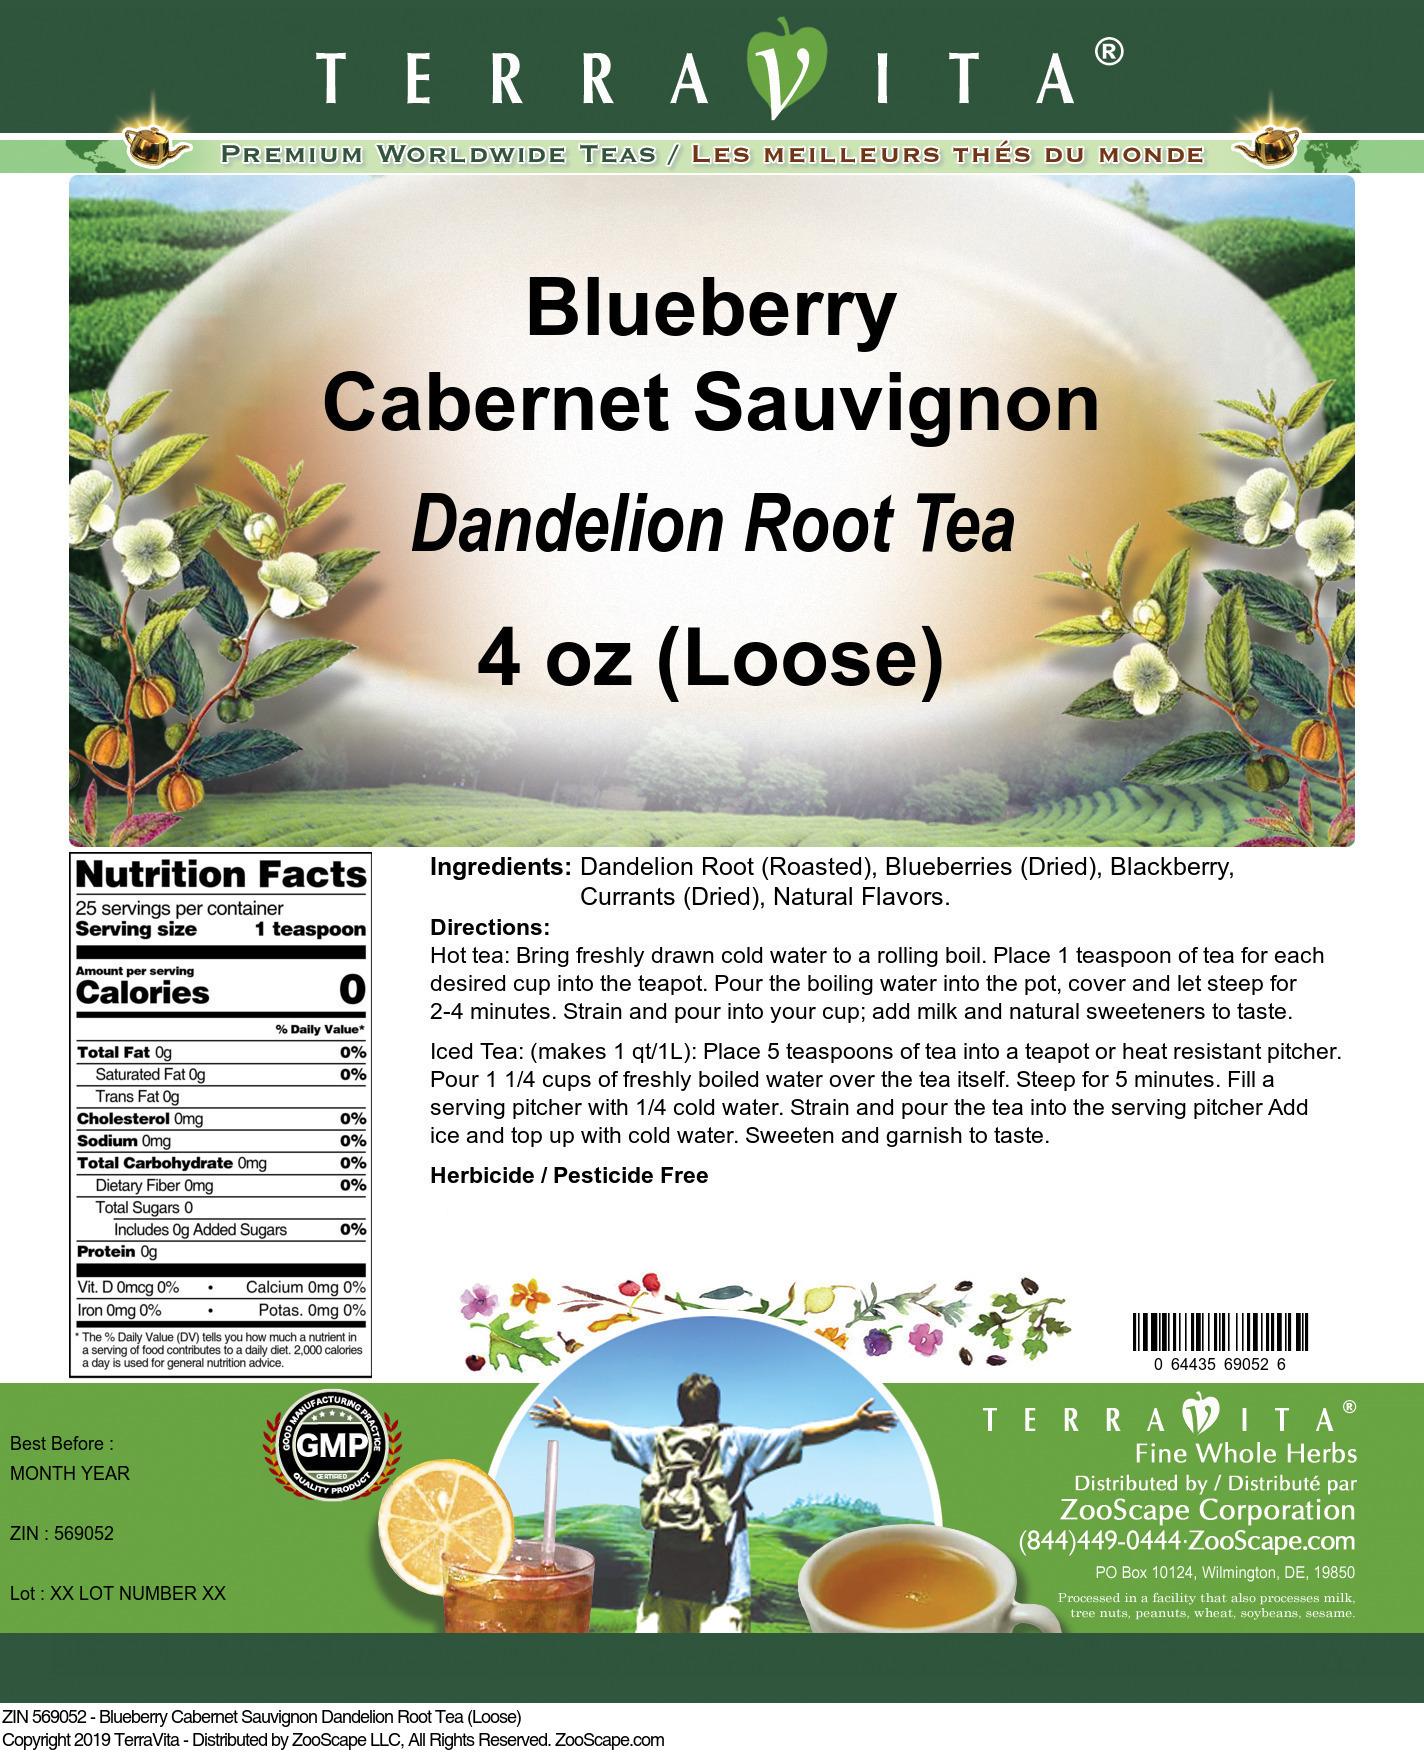 Blueberry Cabernet Sauvignon Dandelion Root